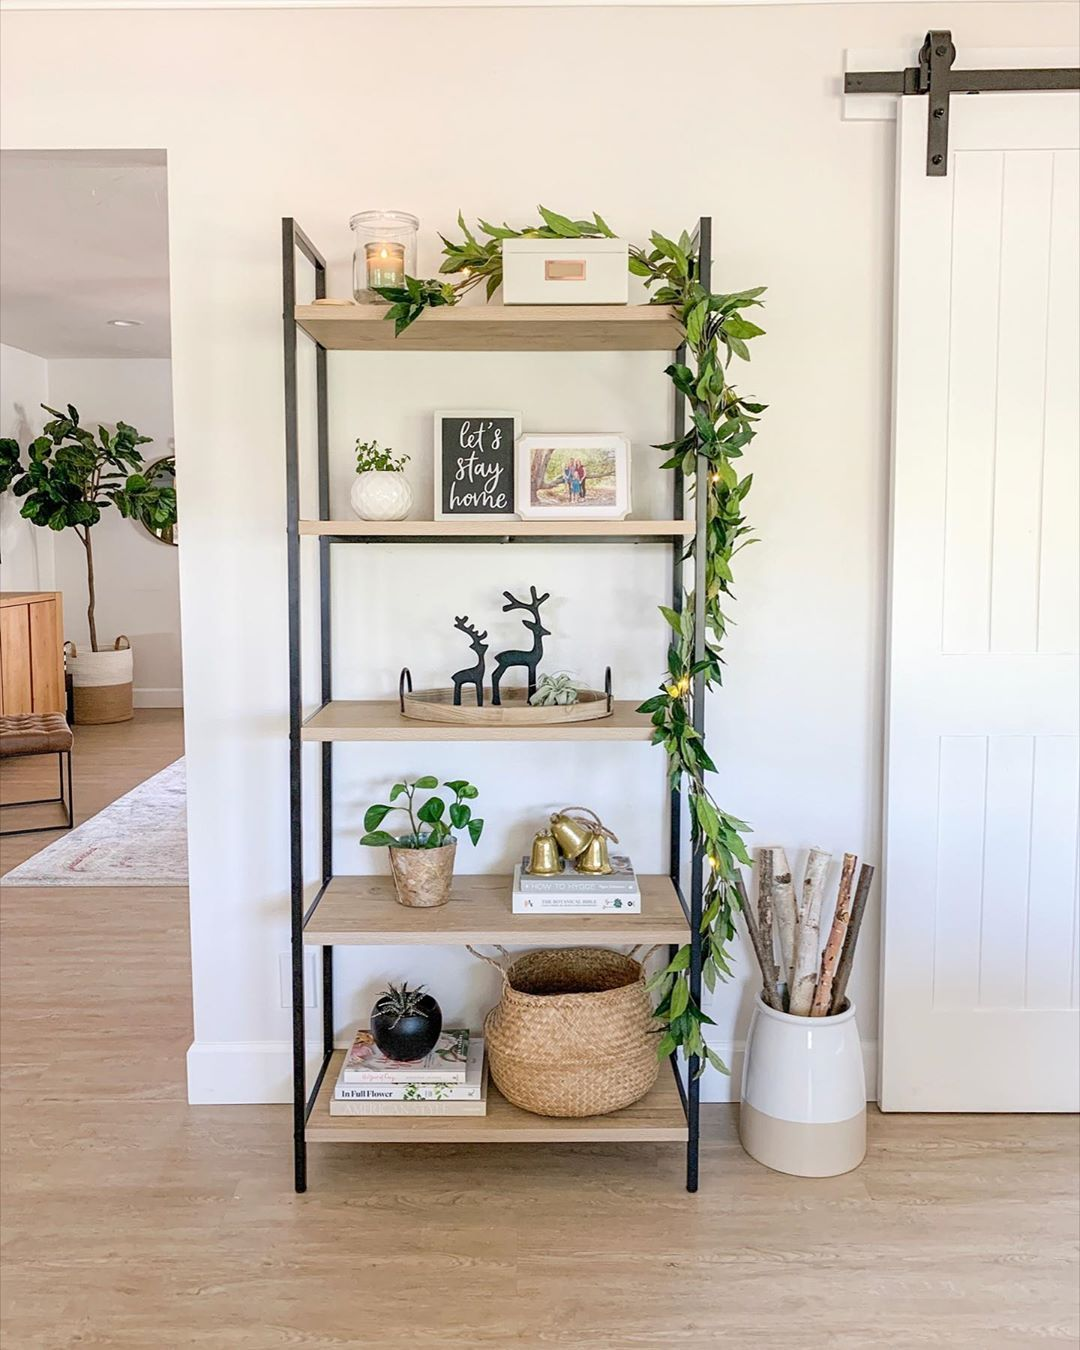 Beth Light On Instagram Our Modern Farmhouse Bookshelf Is On Sale It S A Reader Favorite S Shelf Decor Living Room Diy Apartment Decor Apartment Decor